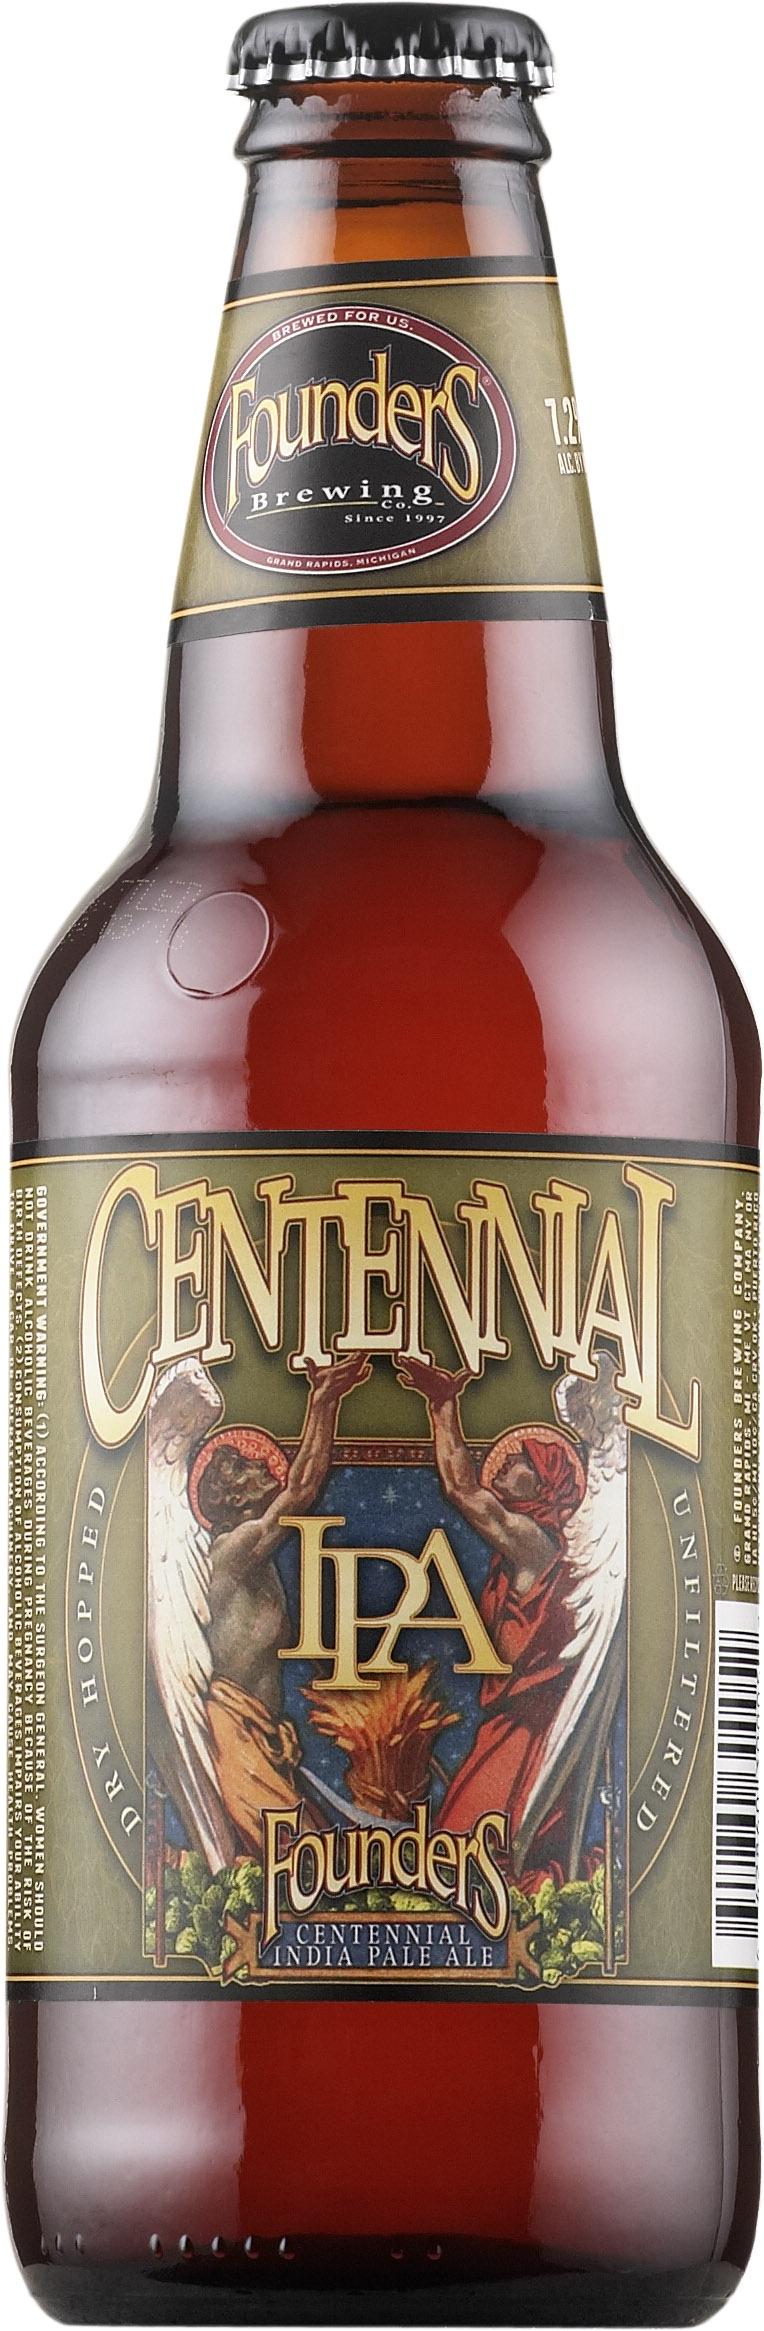 centennial-ipa